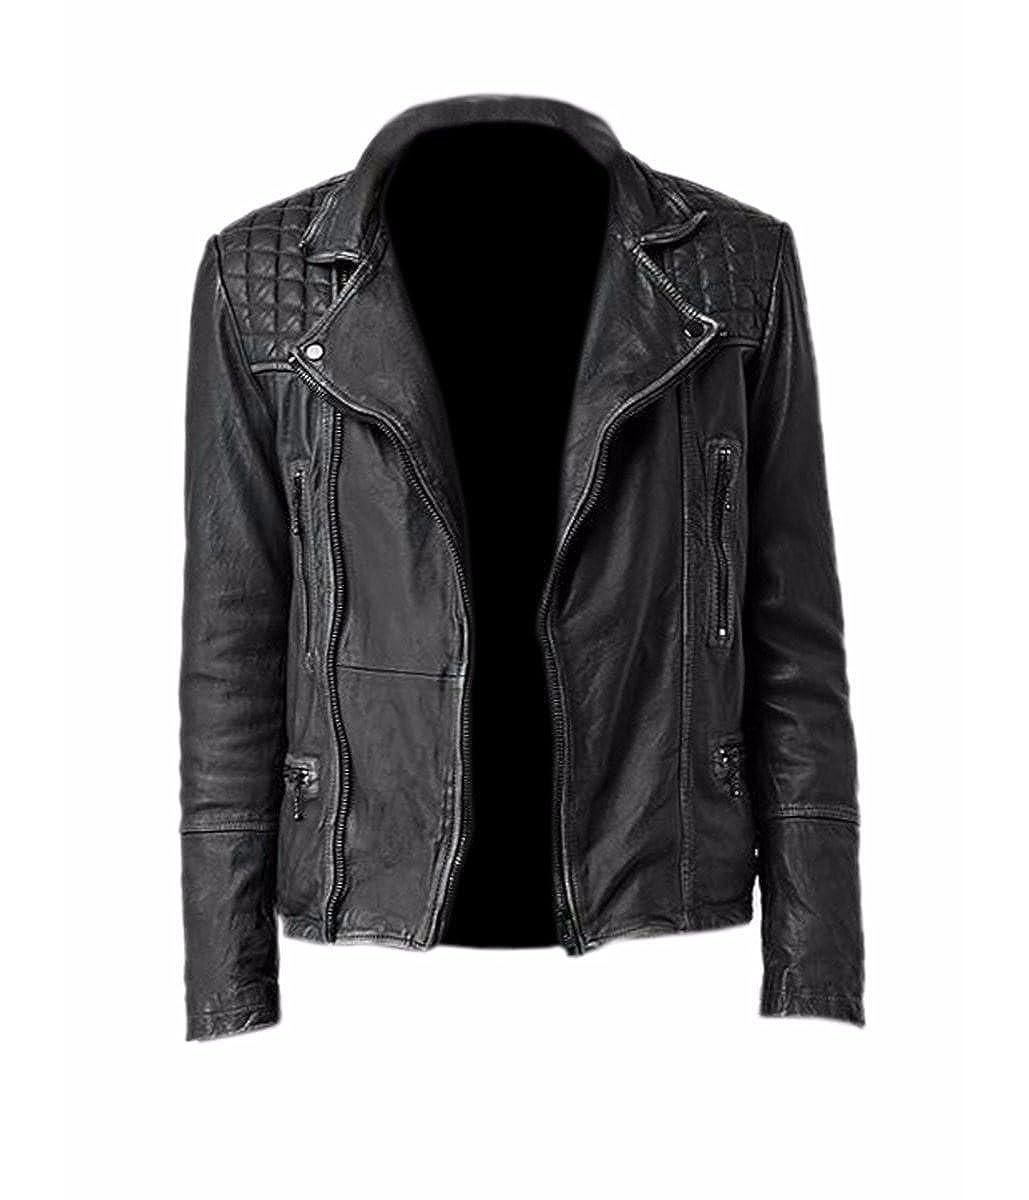 21a4f92c5c9 Amazon.com: Feather Skin Mens Clothing Cargo Biker Leather Jacket ...